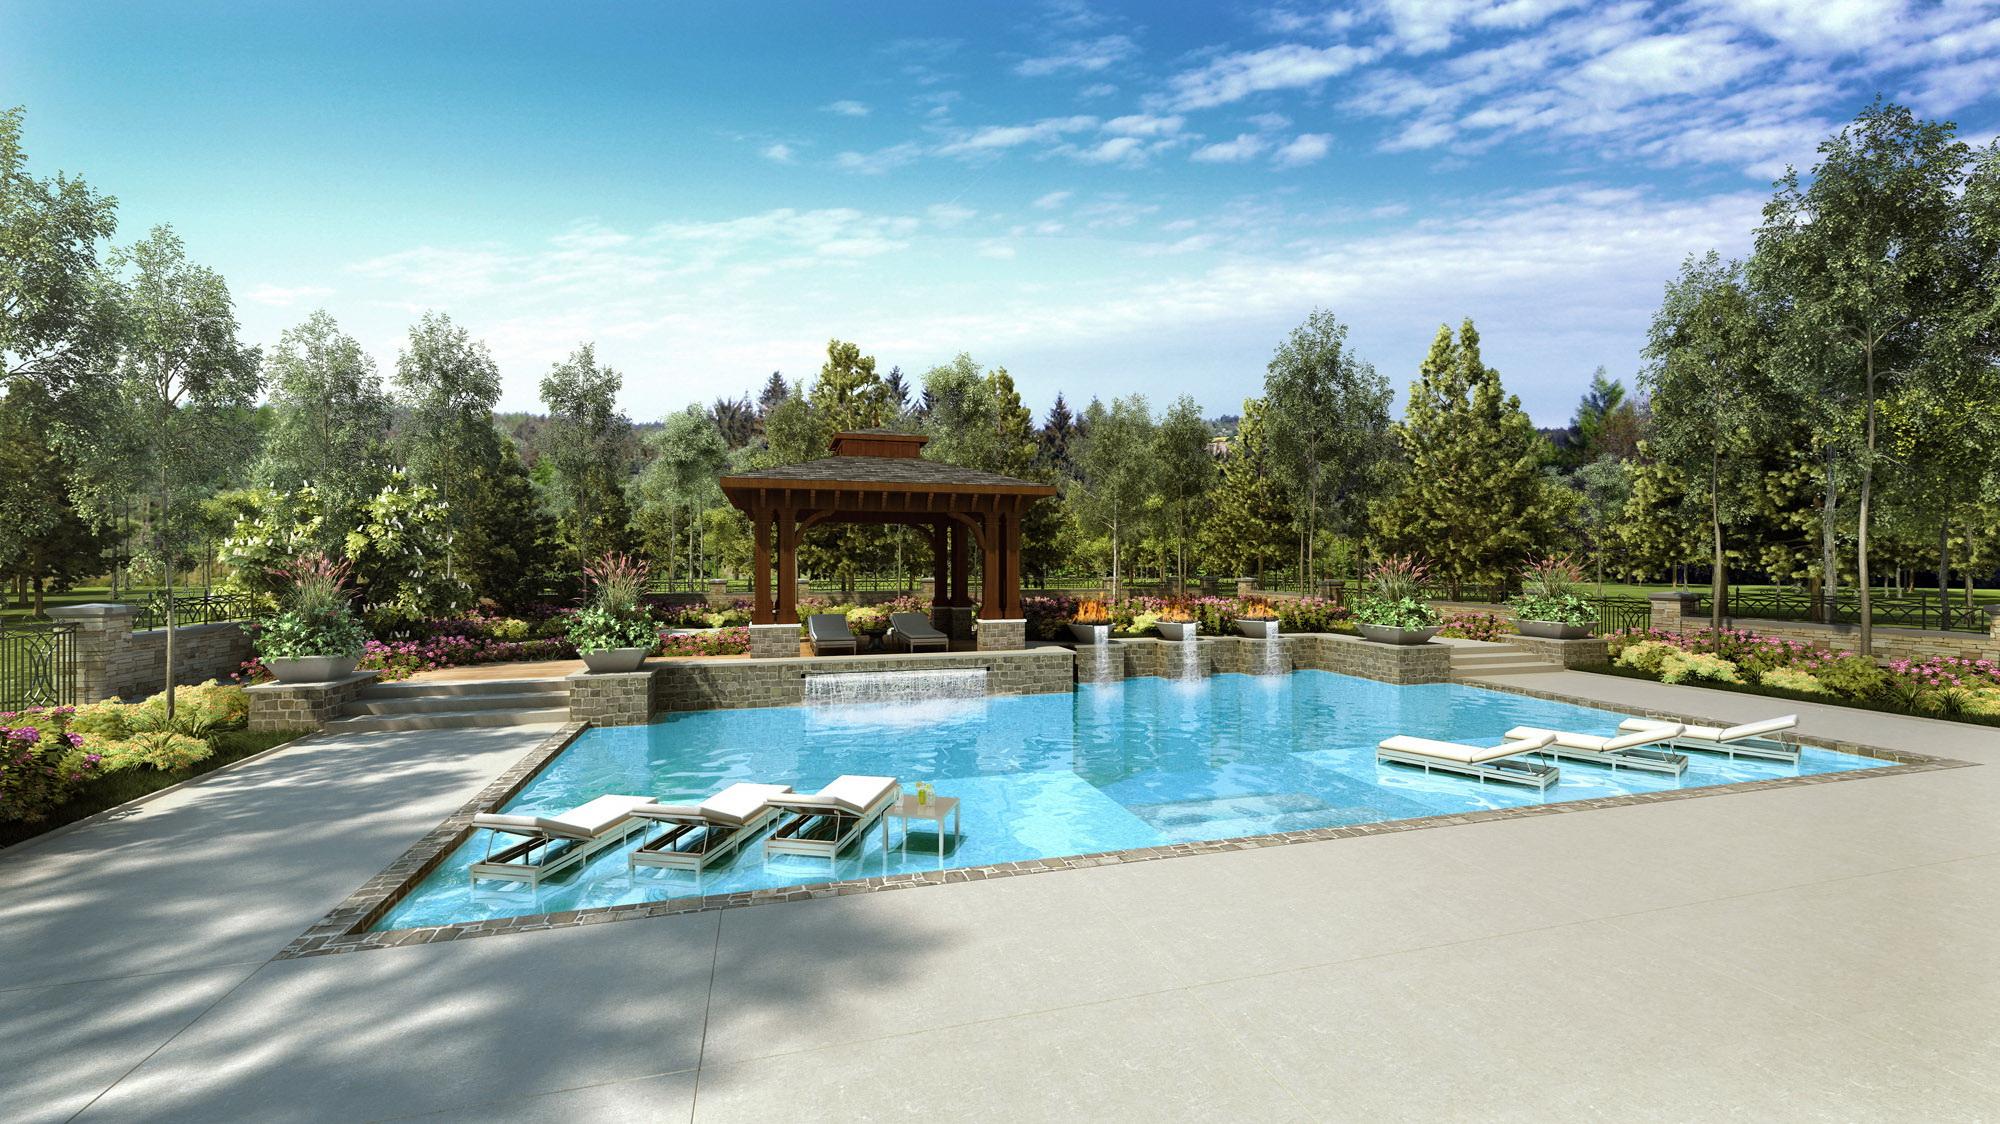 home landscape 3D visualization